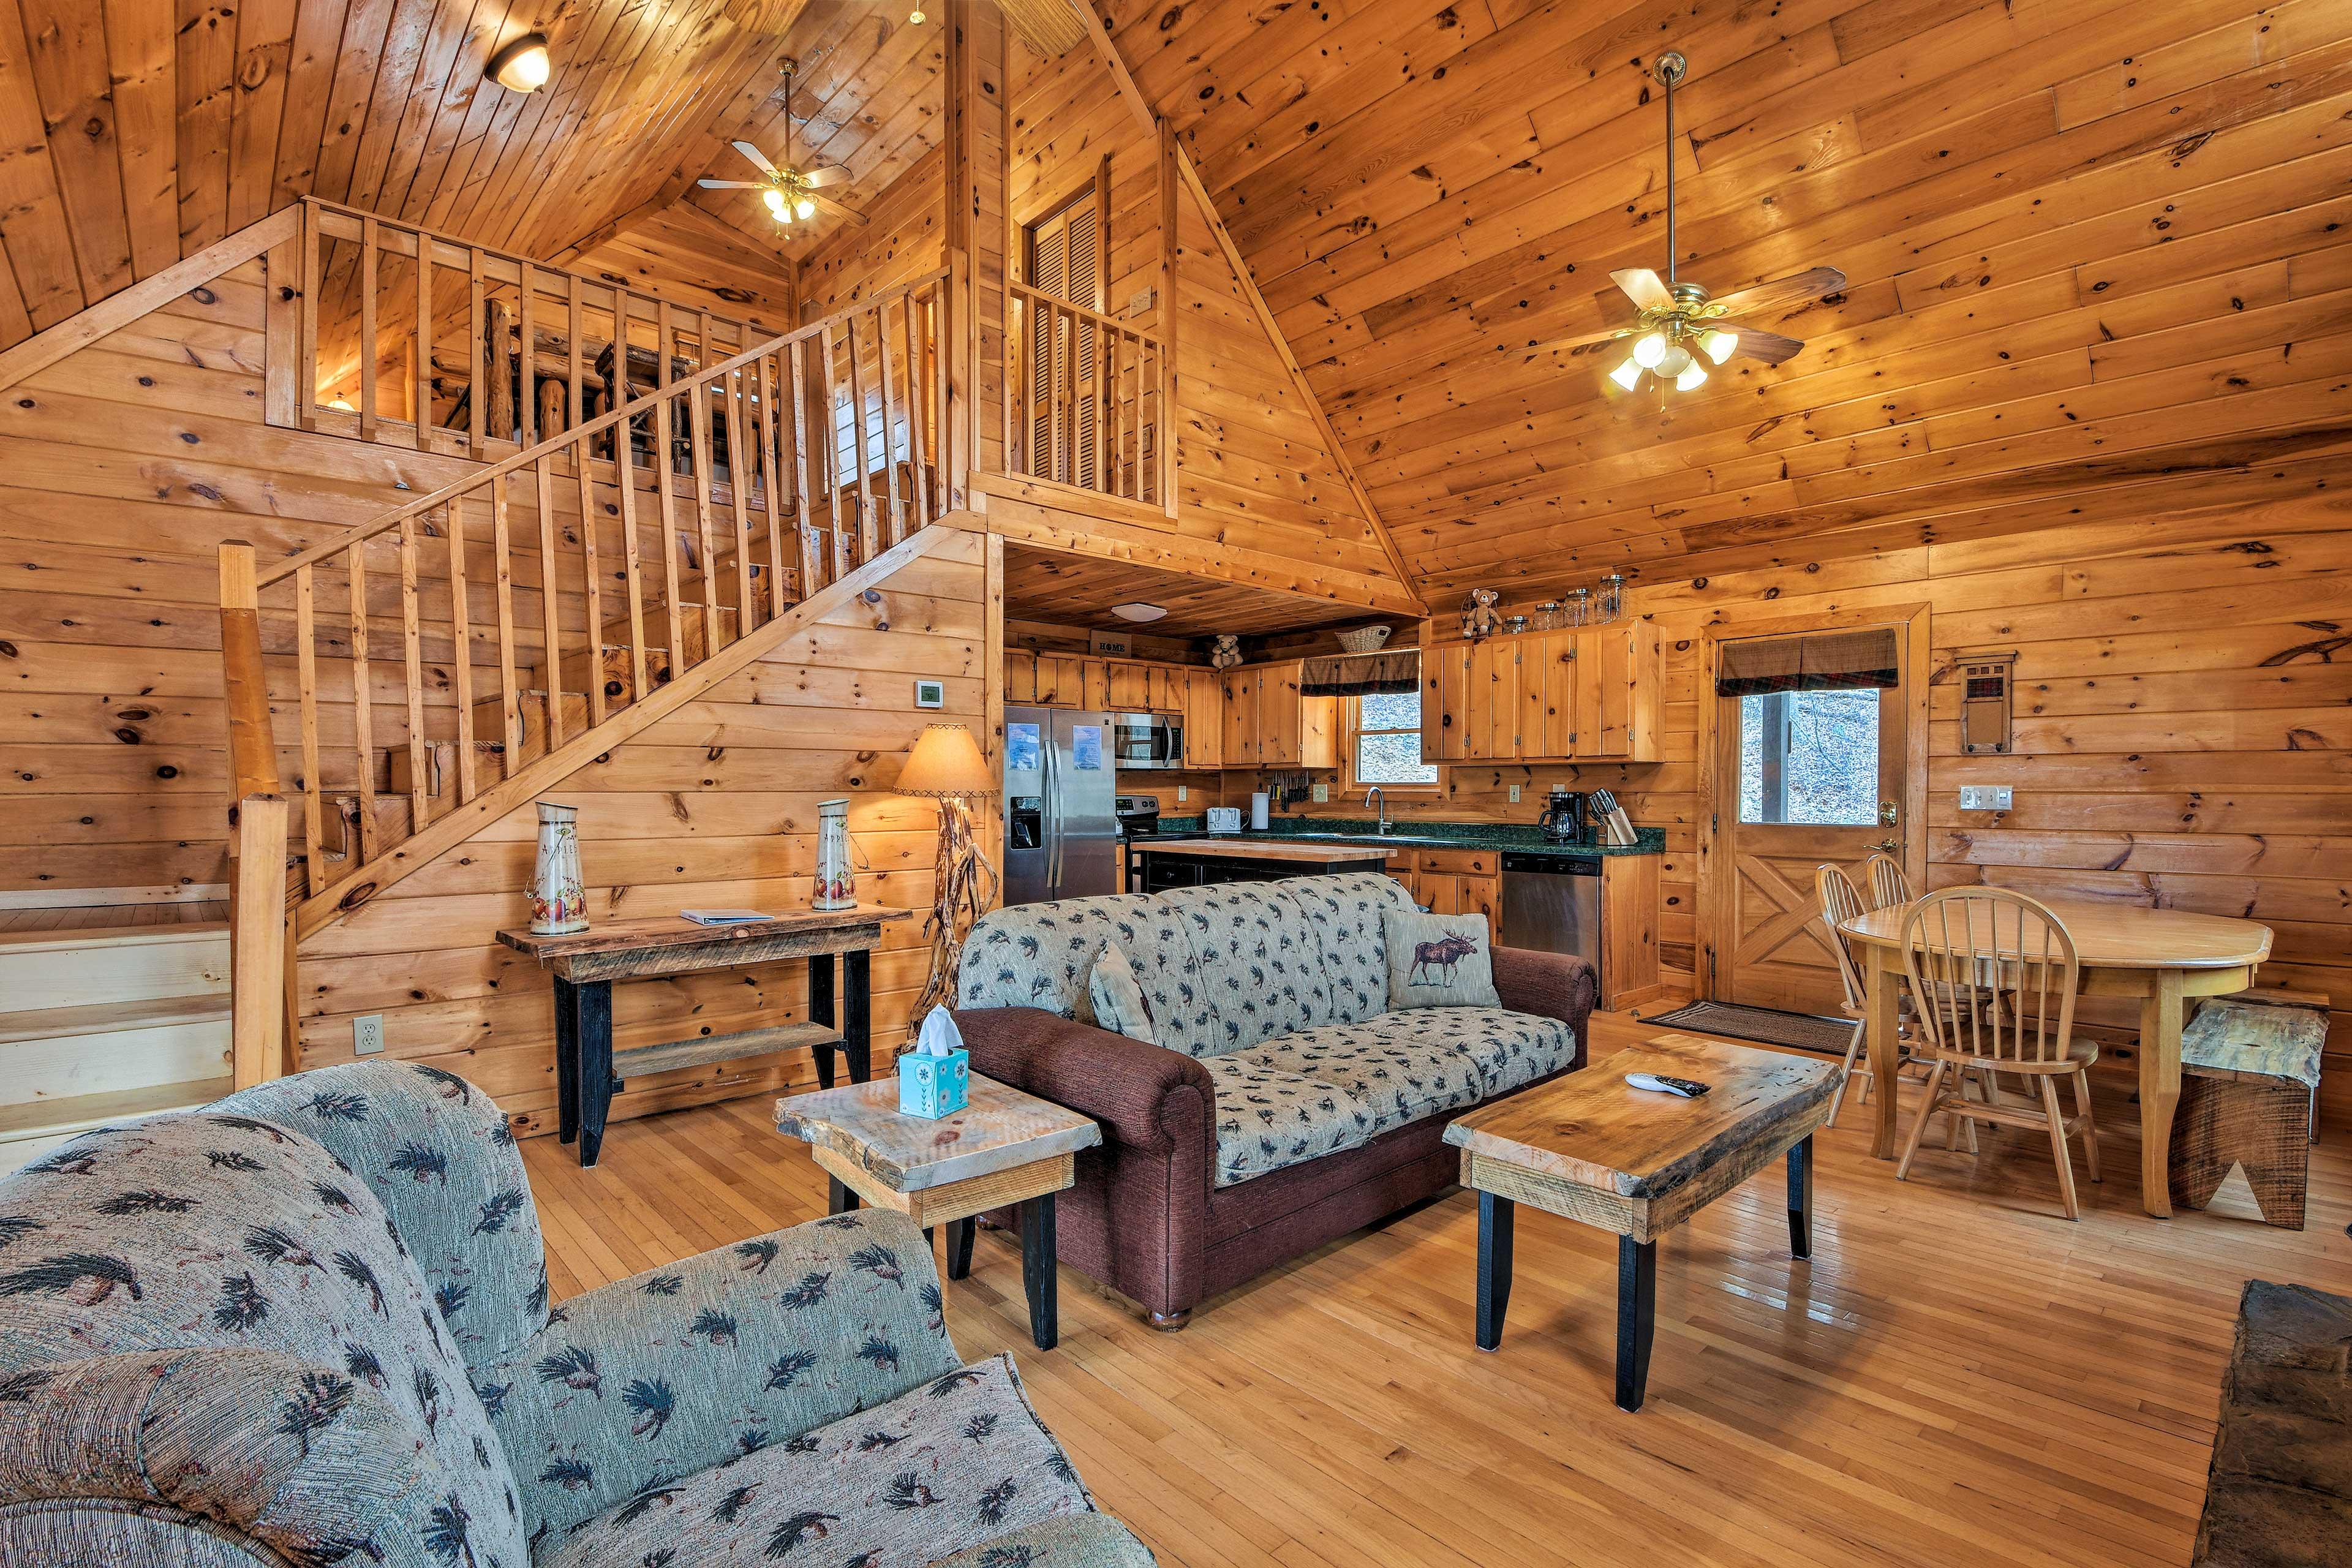 Hardwood floors and wood-paneled walls create a cozy cabin interior.